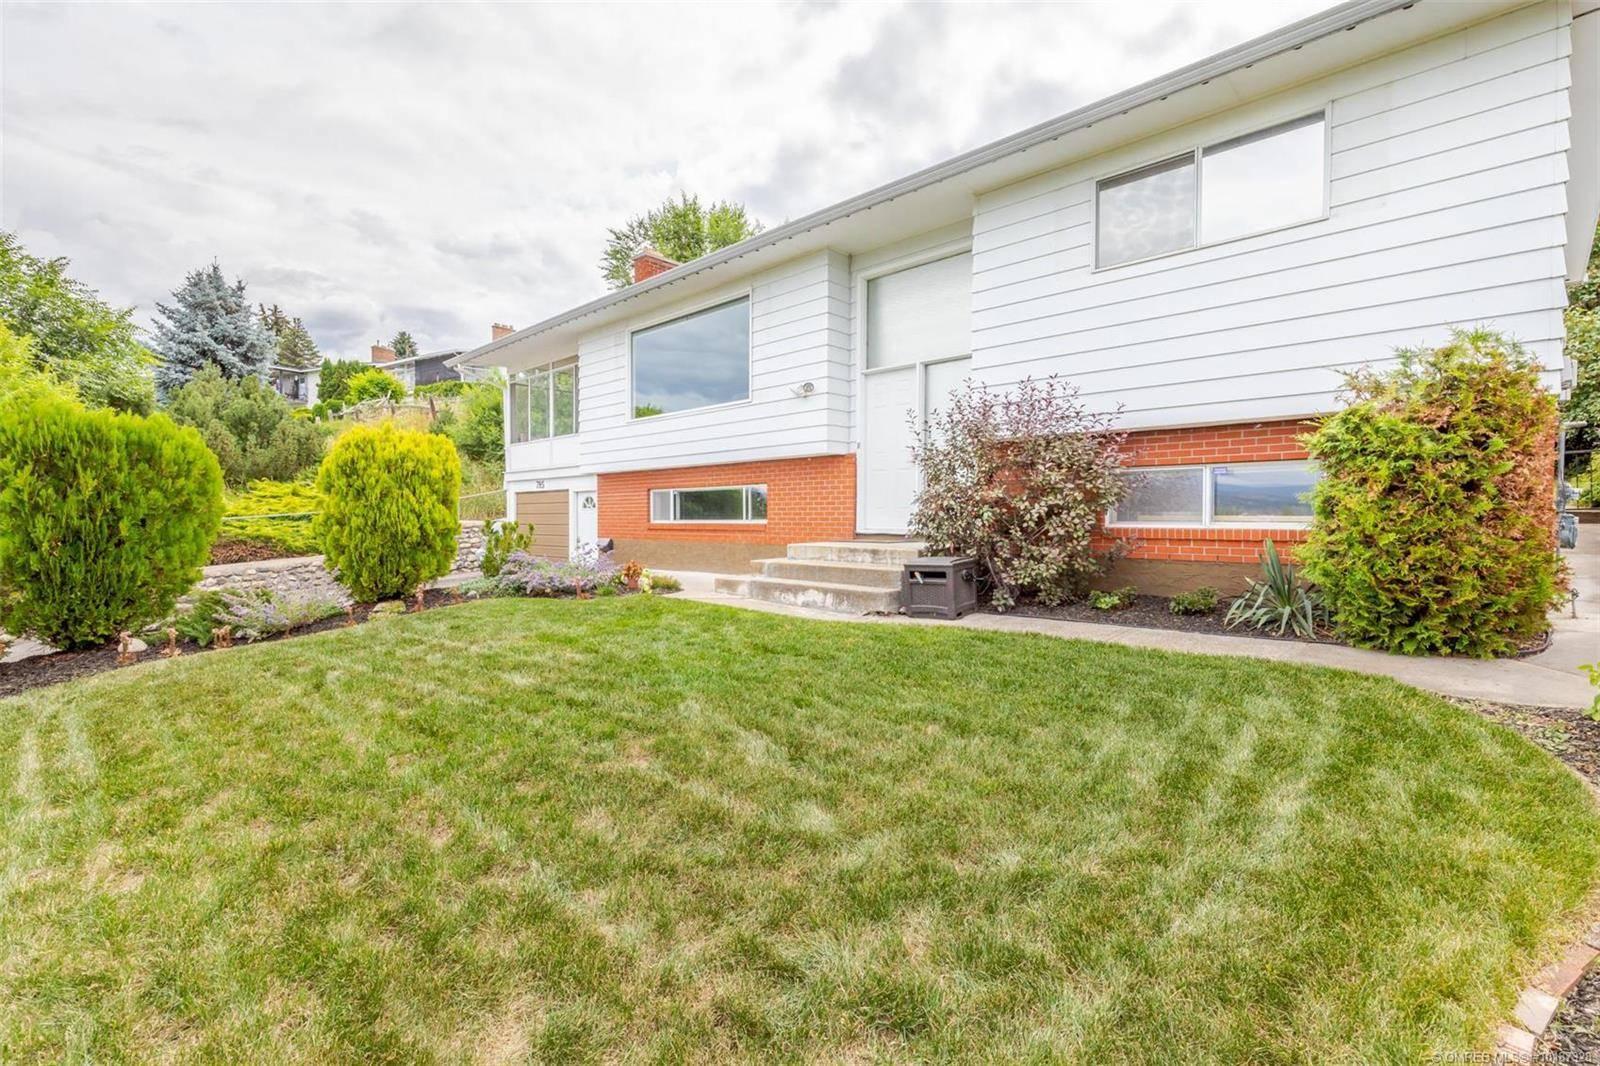 House for sale at 785 Mckenzie Rd Kelowna British Columbia - MLS: 10187328